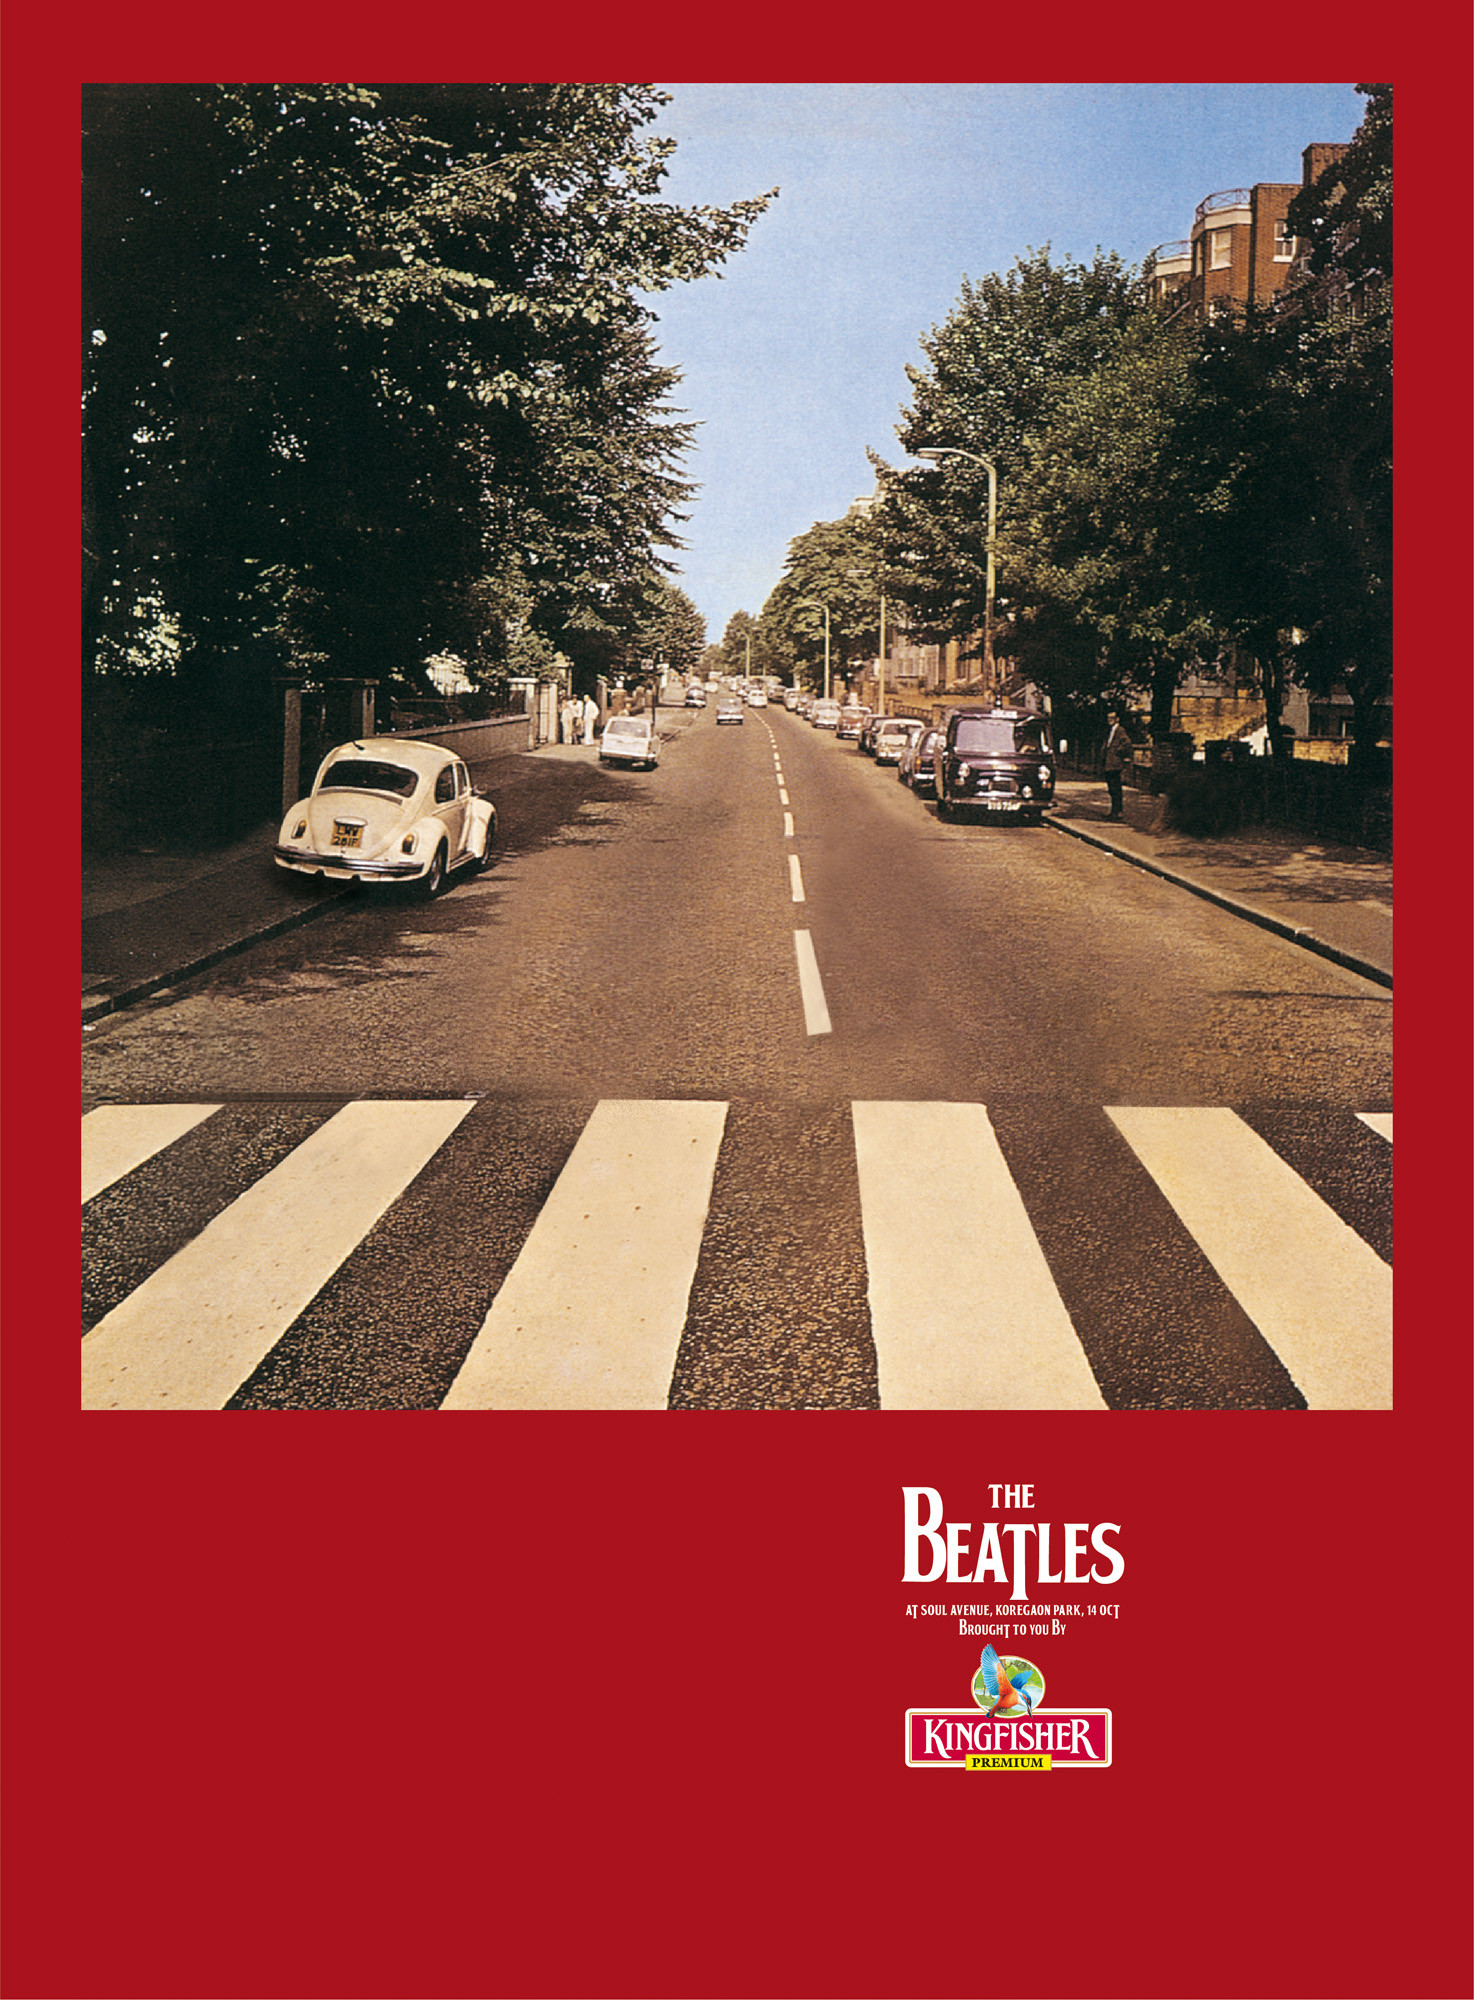 Kingfisher - Beatles.jpg